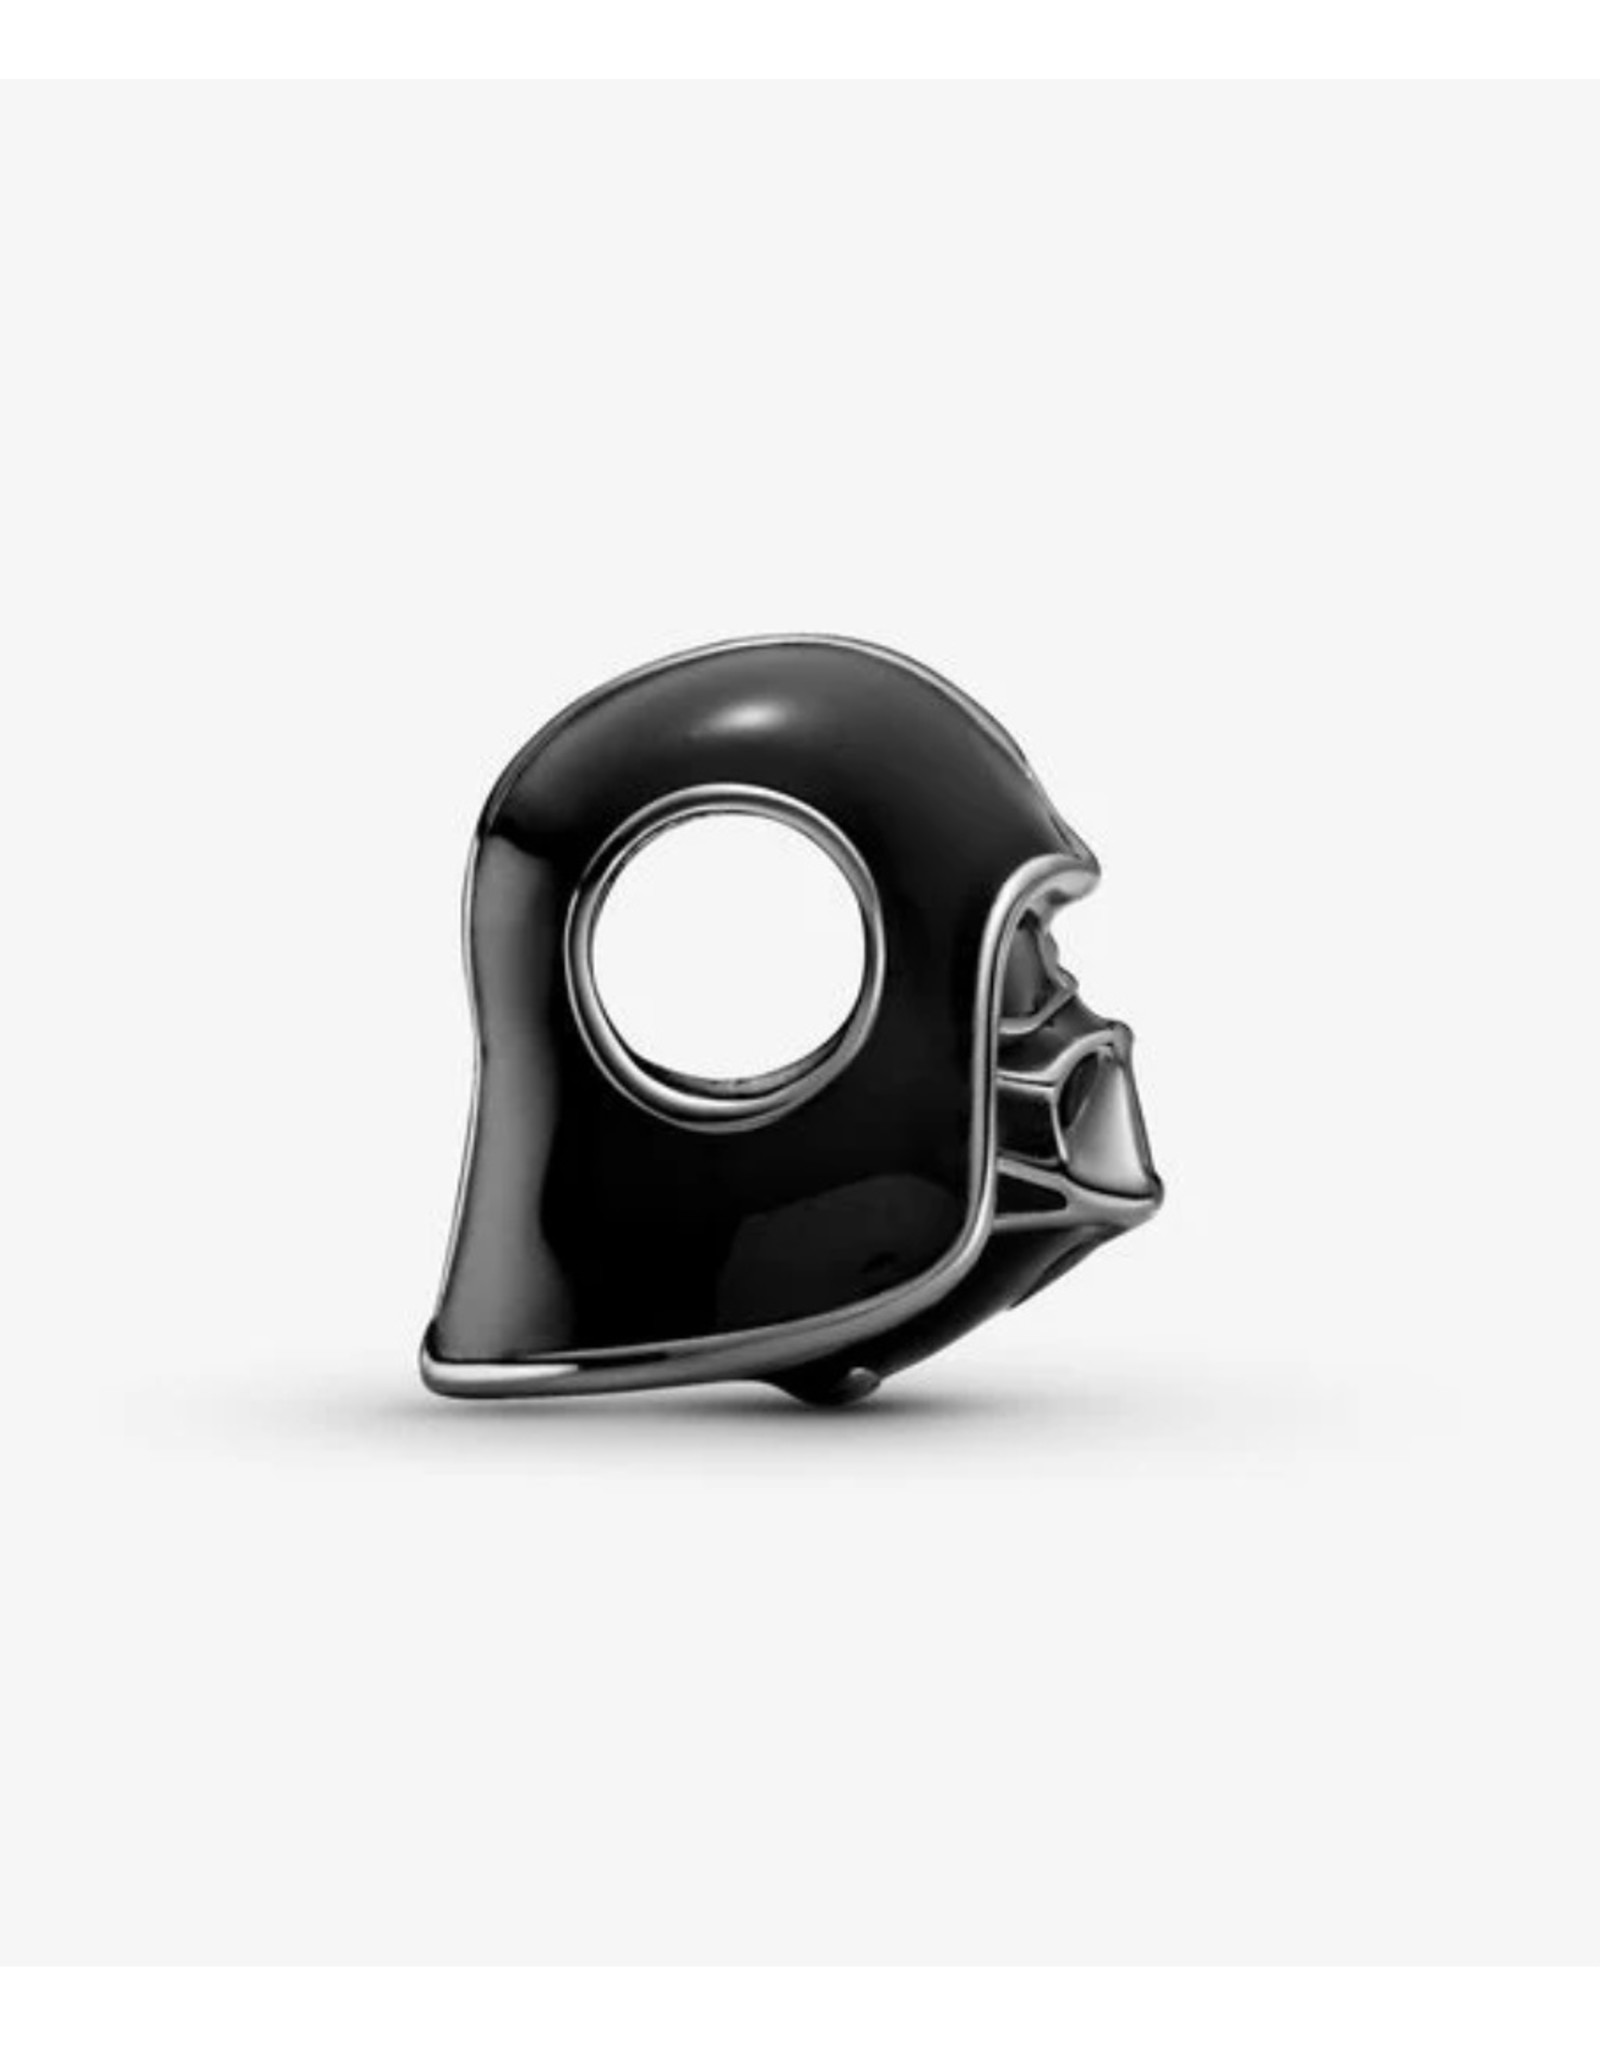 Pandora Pandora Charm,799256C01, Star Wars, Darth Vader, Black Enamel